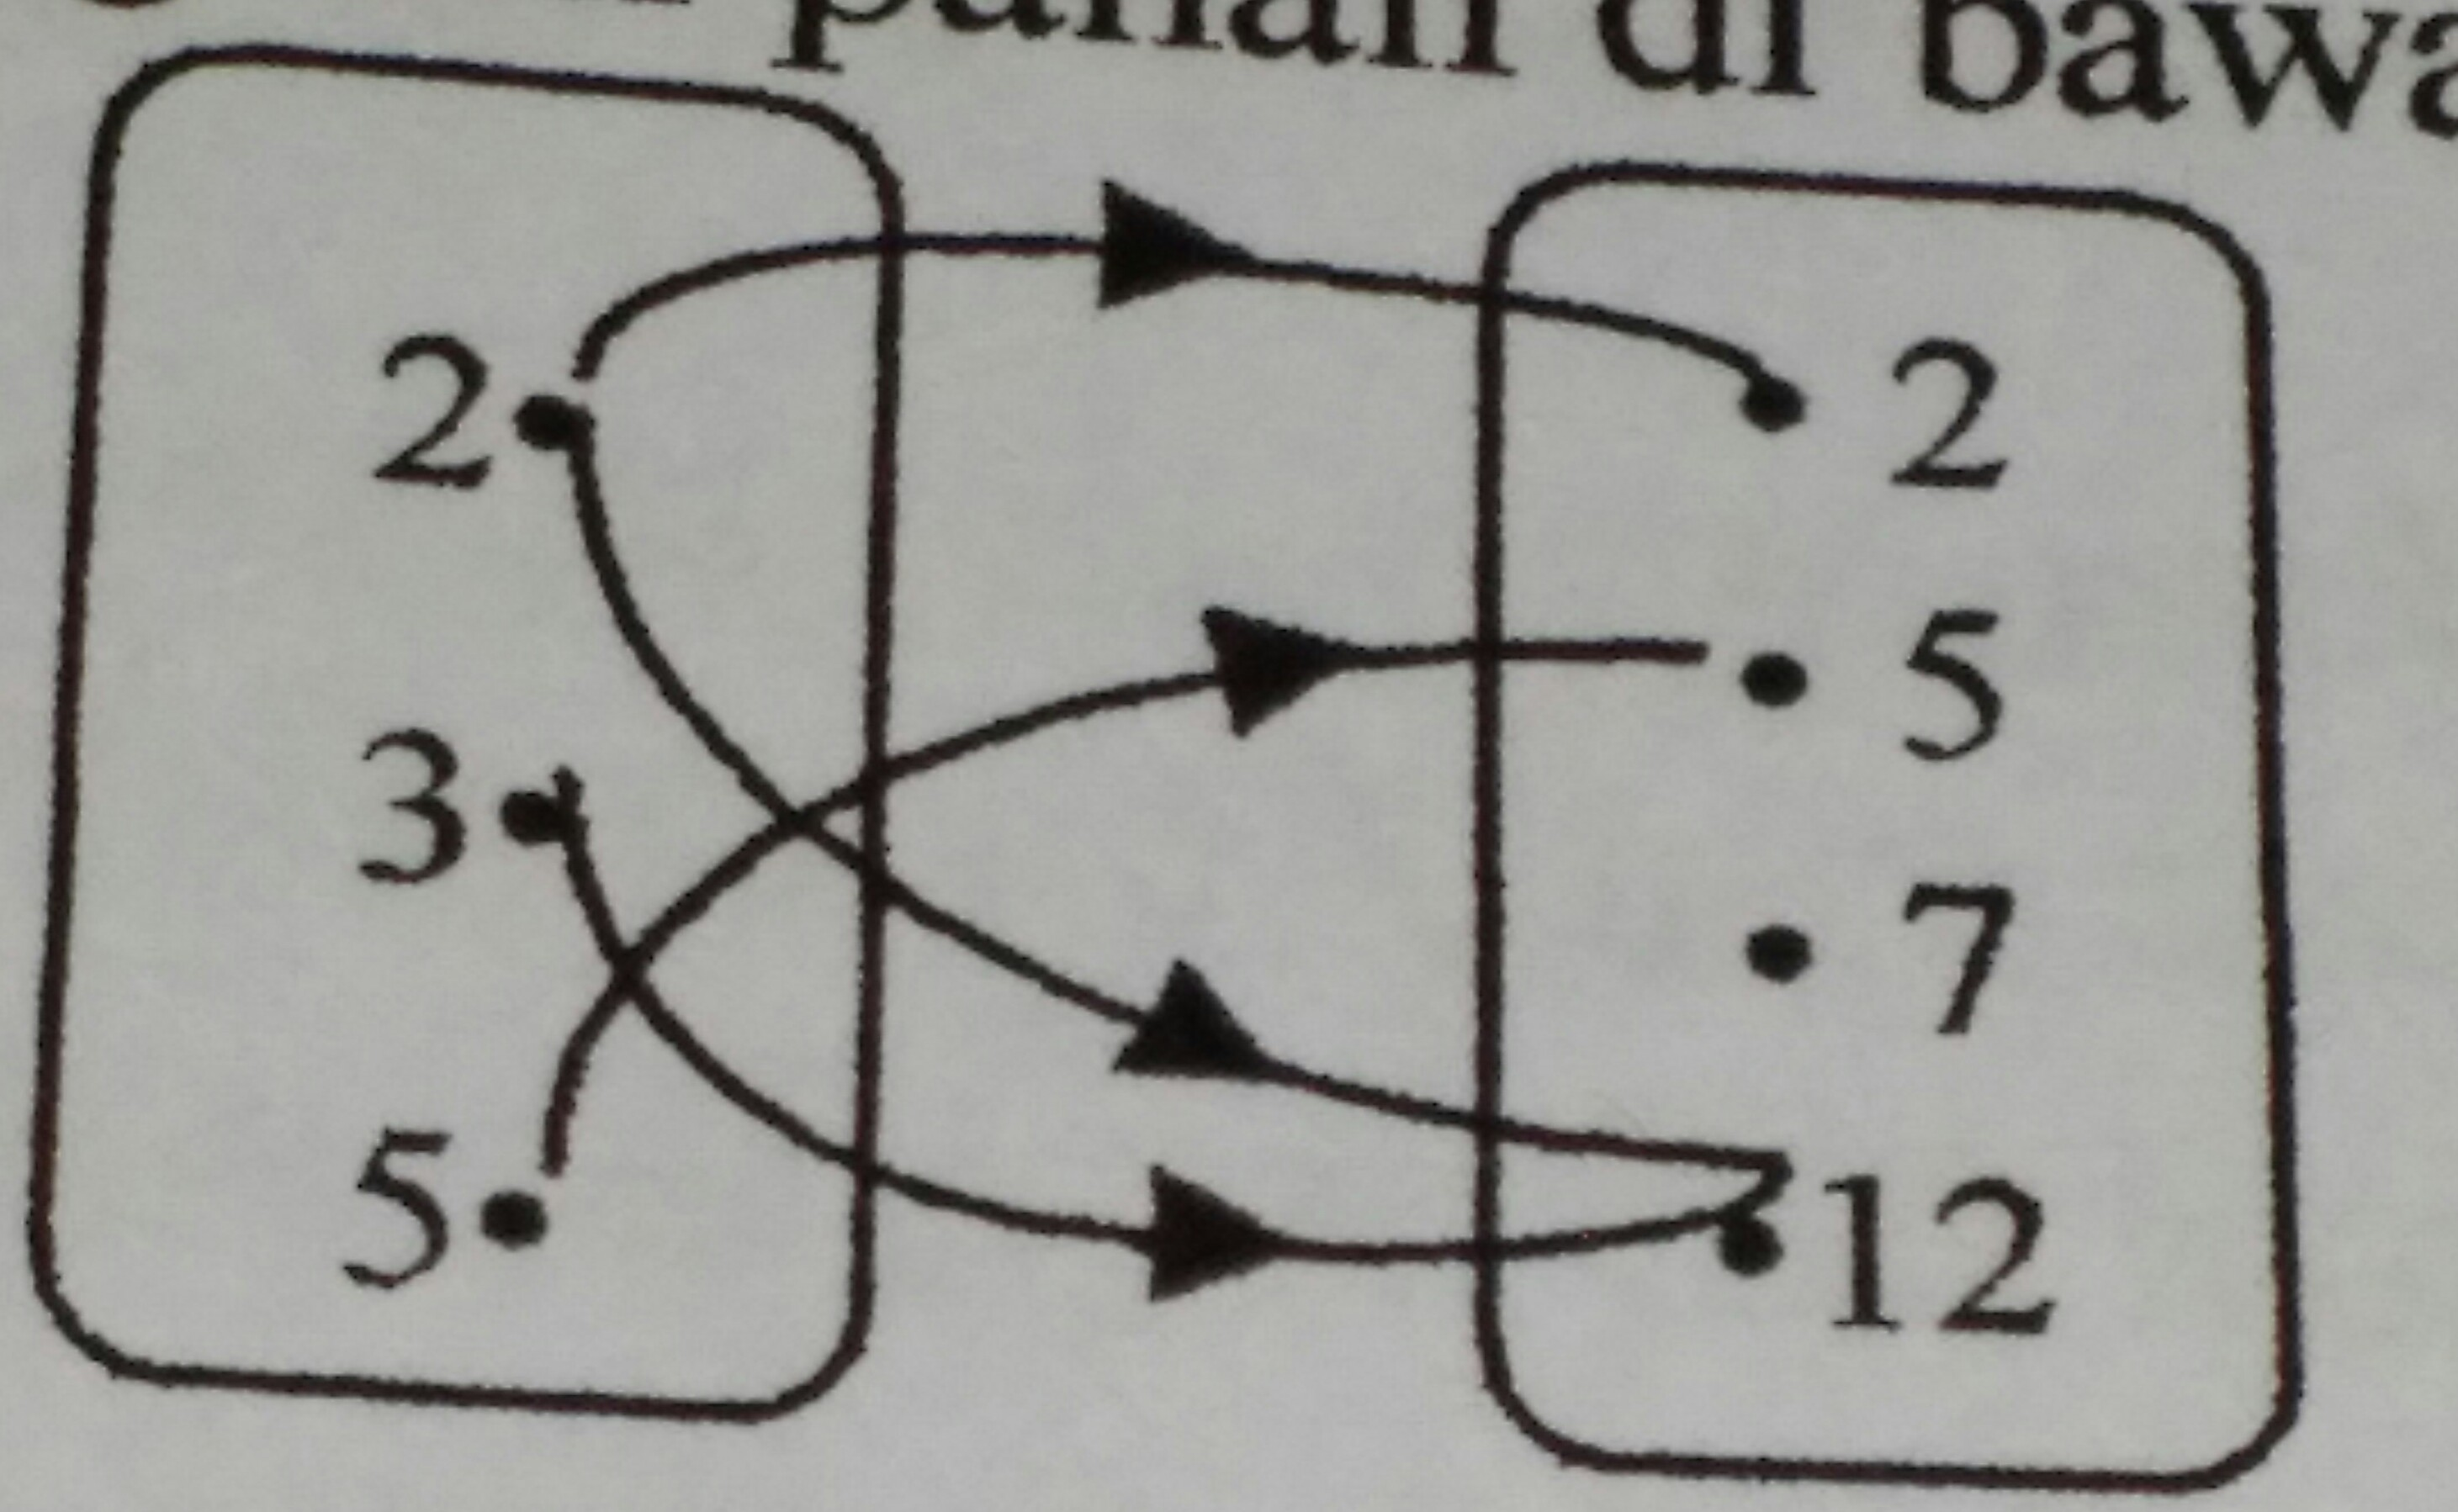 Daerah kawan pada diagram panah di bawah ini adalah brainly daerah kawan pada diagram panah di bawah ini adalah ccuart Choice Image